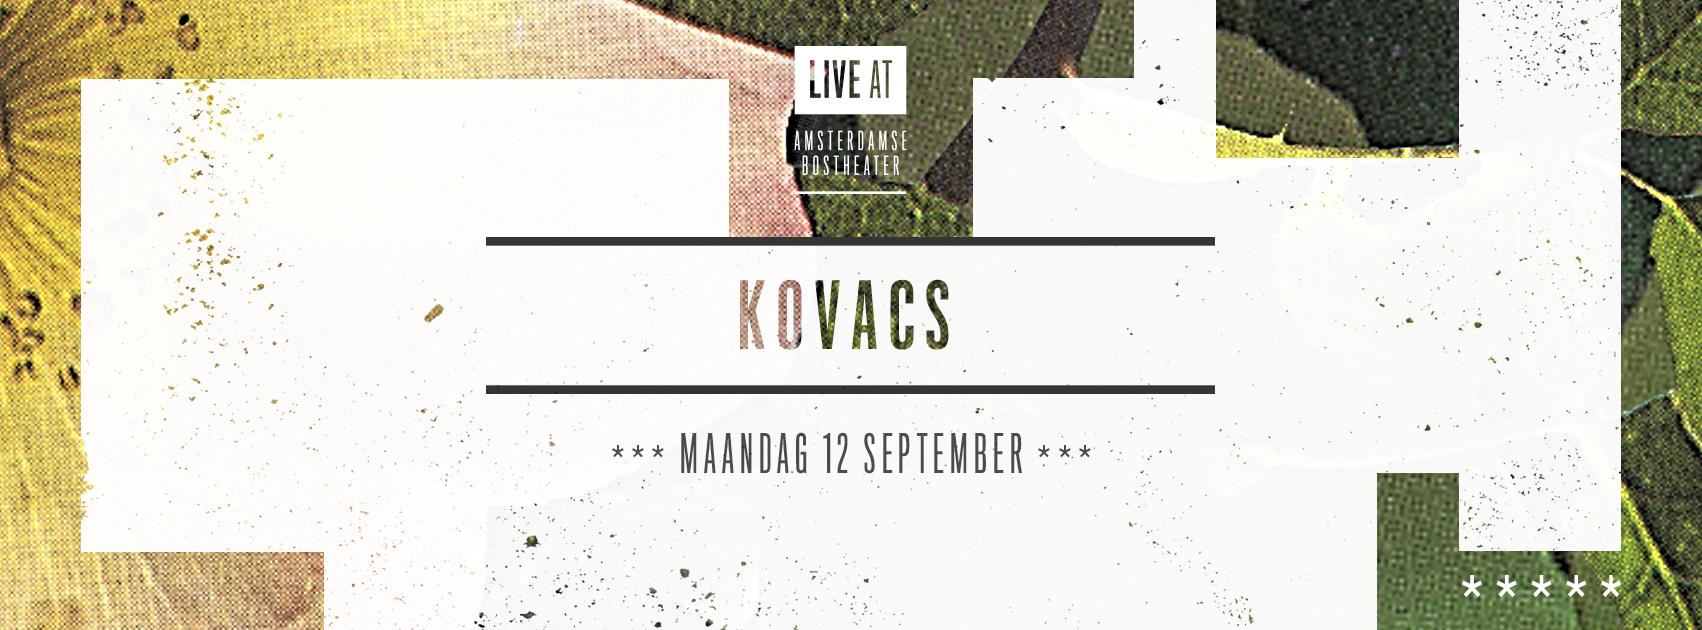 omslagfoto-kovacs